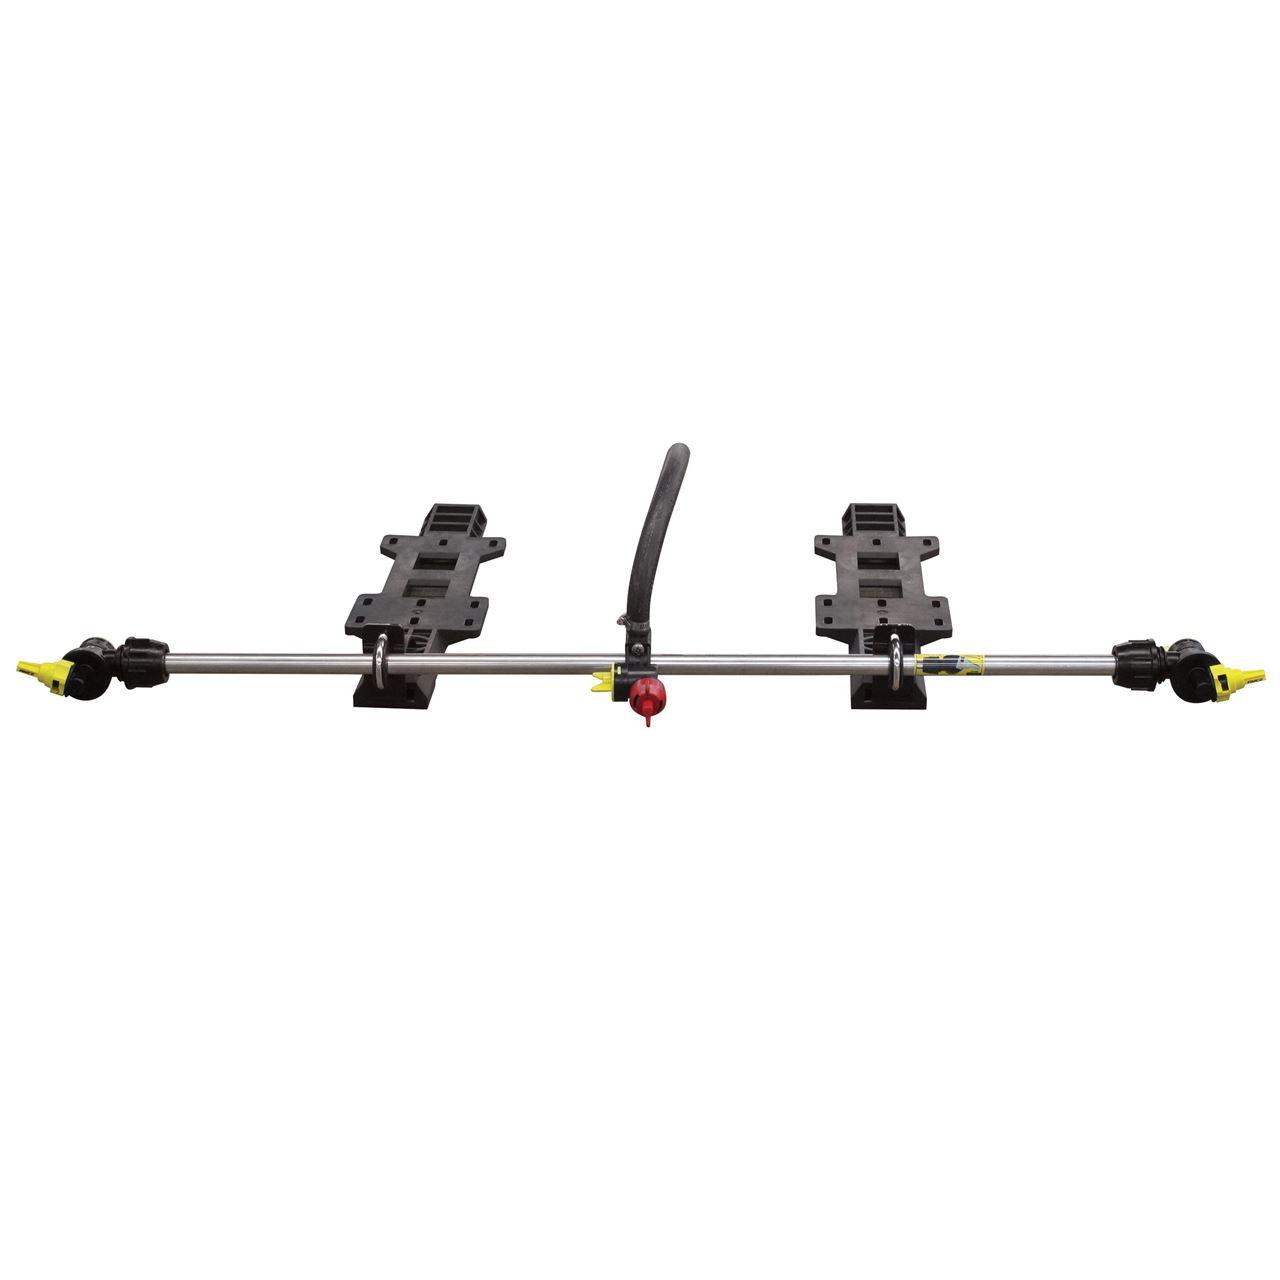 www.PWMall.com. PWMall-5302334-ATV Boom Kit, 3 Nozzle Boom